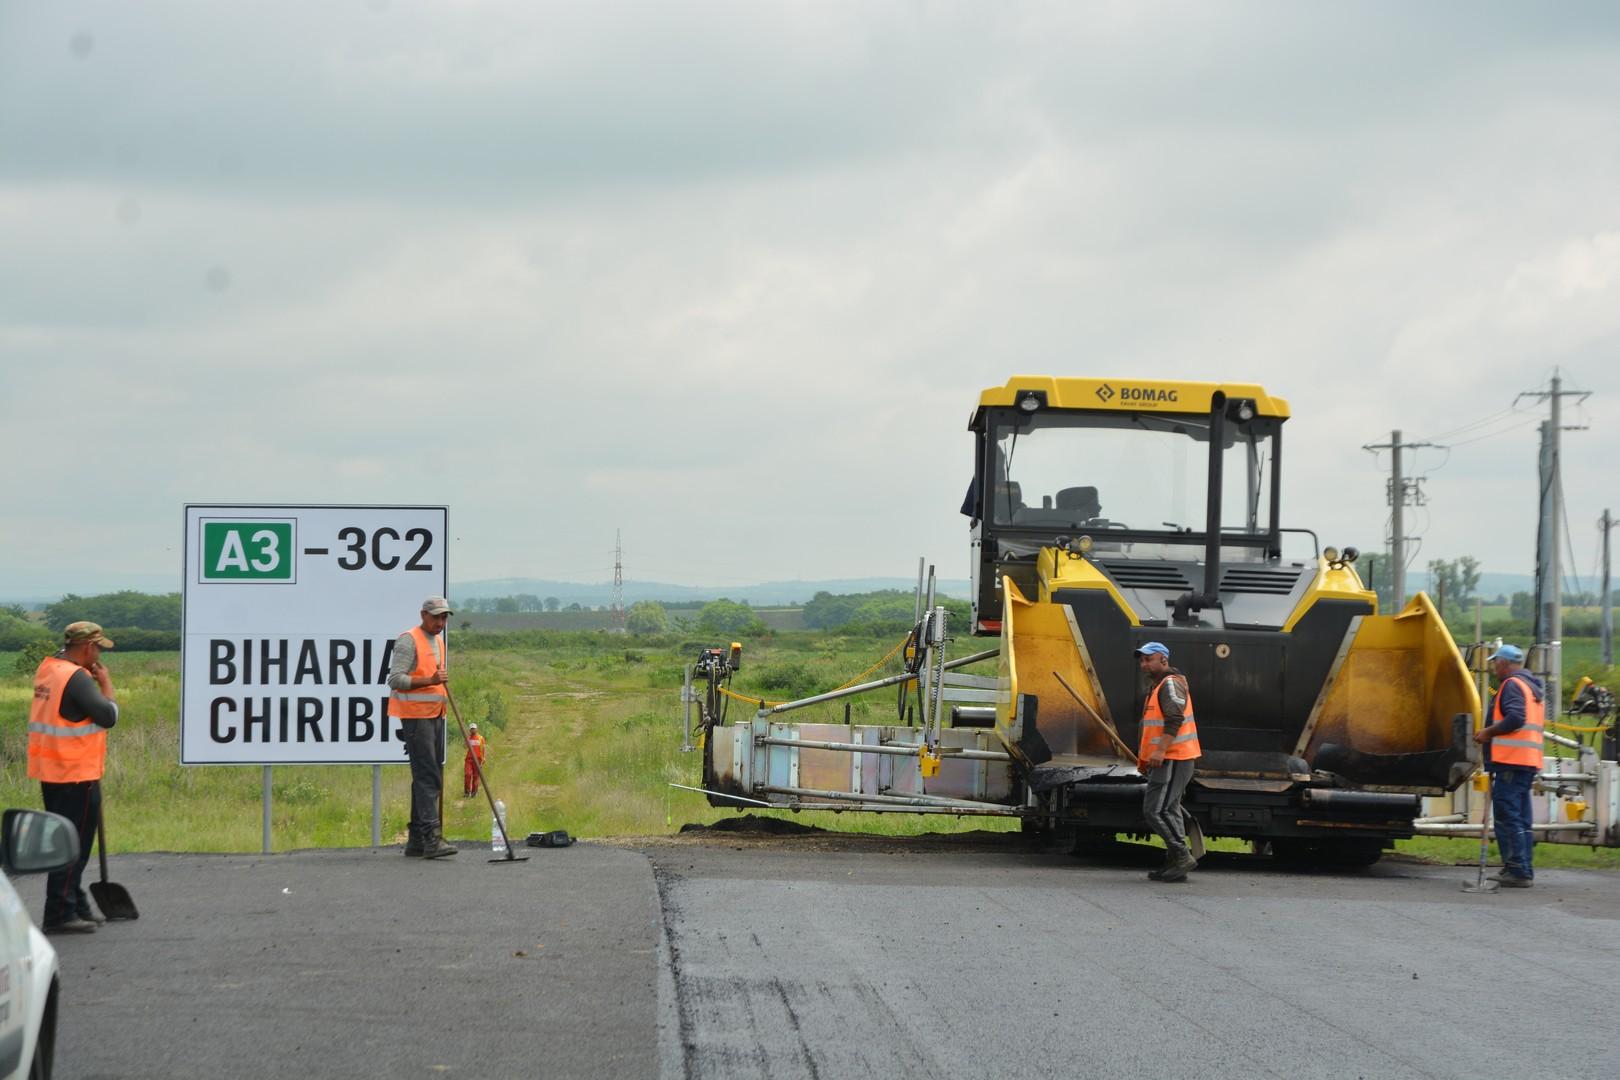 FOTO: Semnare contract autostradă Biharia - Chiribiș 12.06.2020